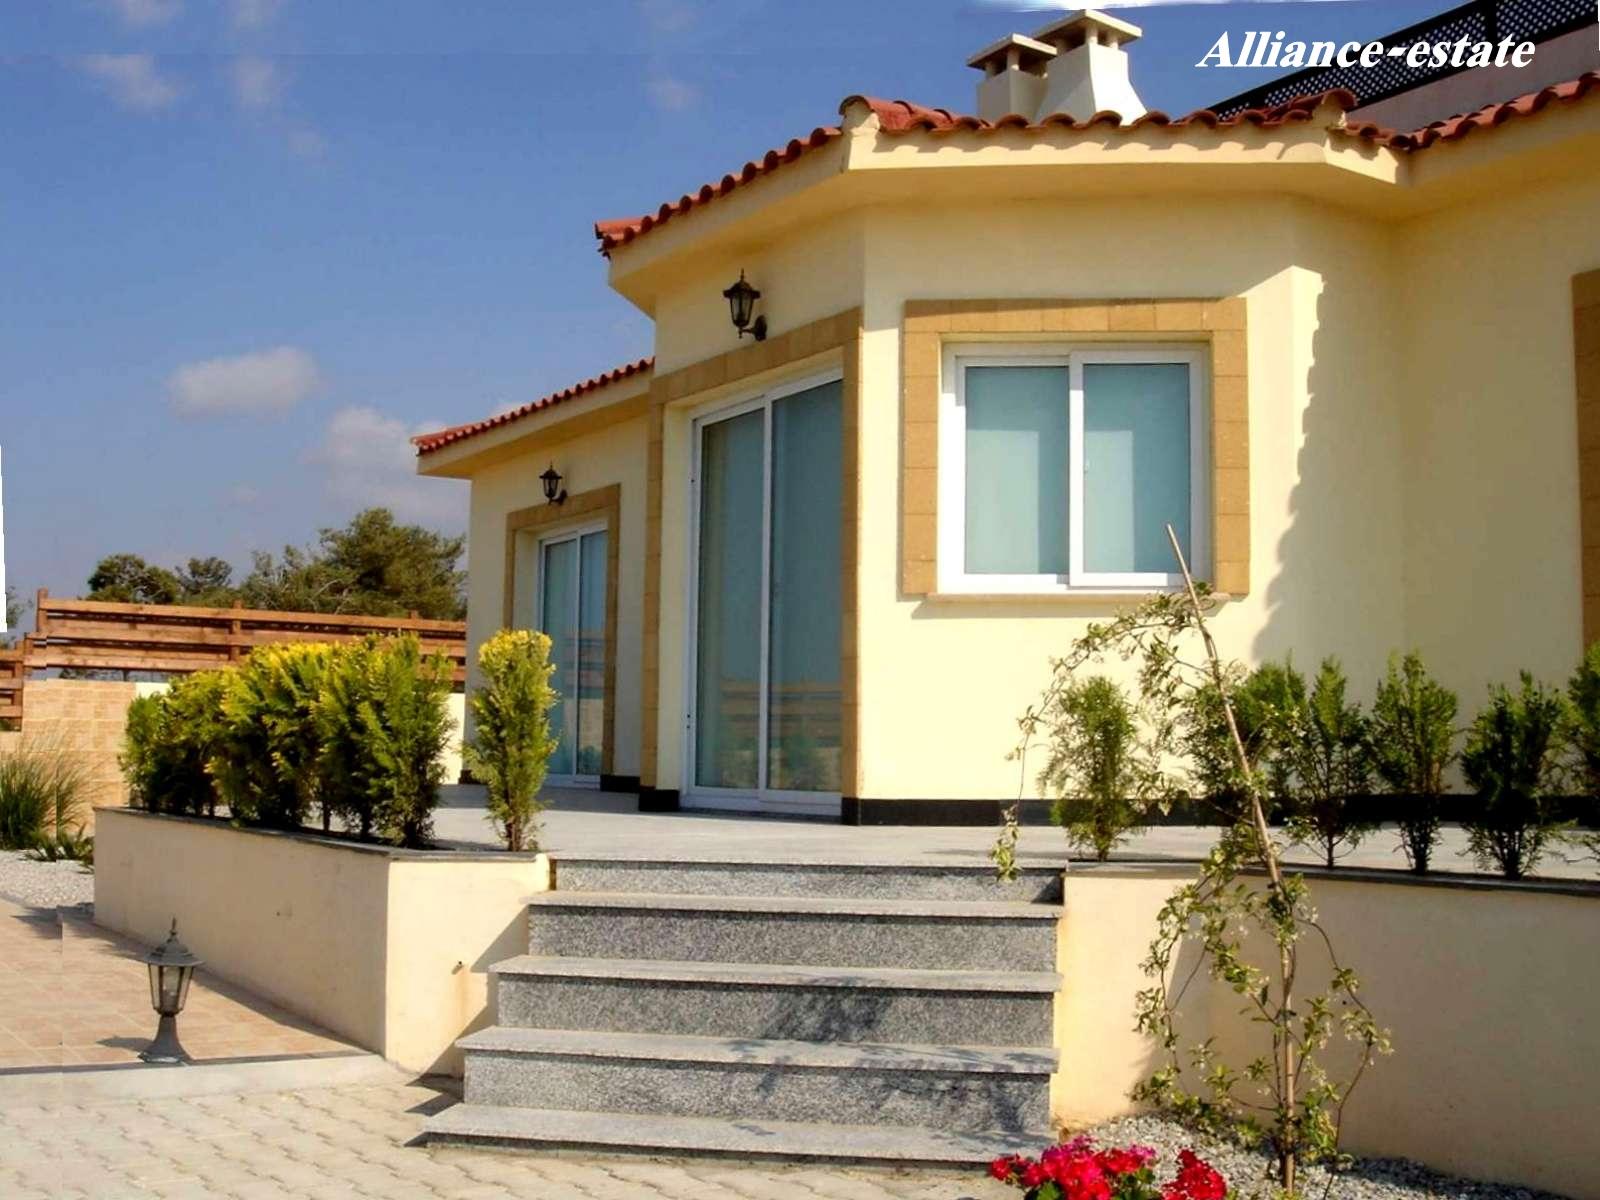 Продам дом на кипре украина